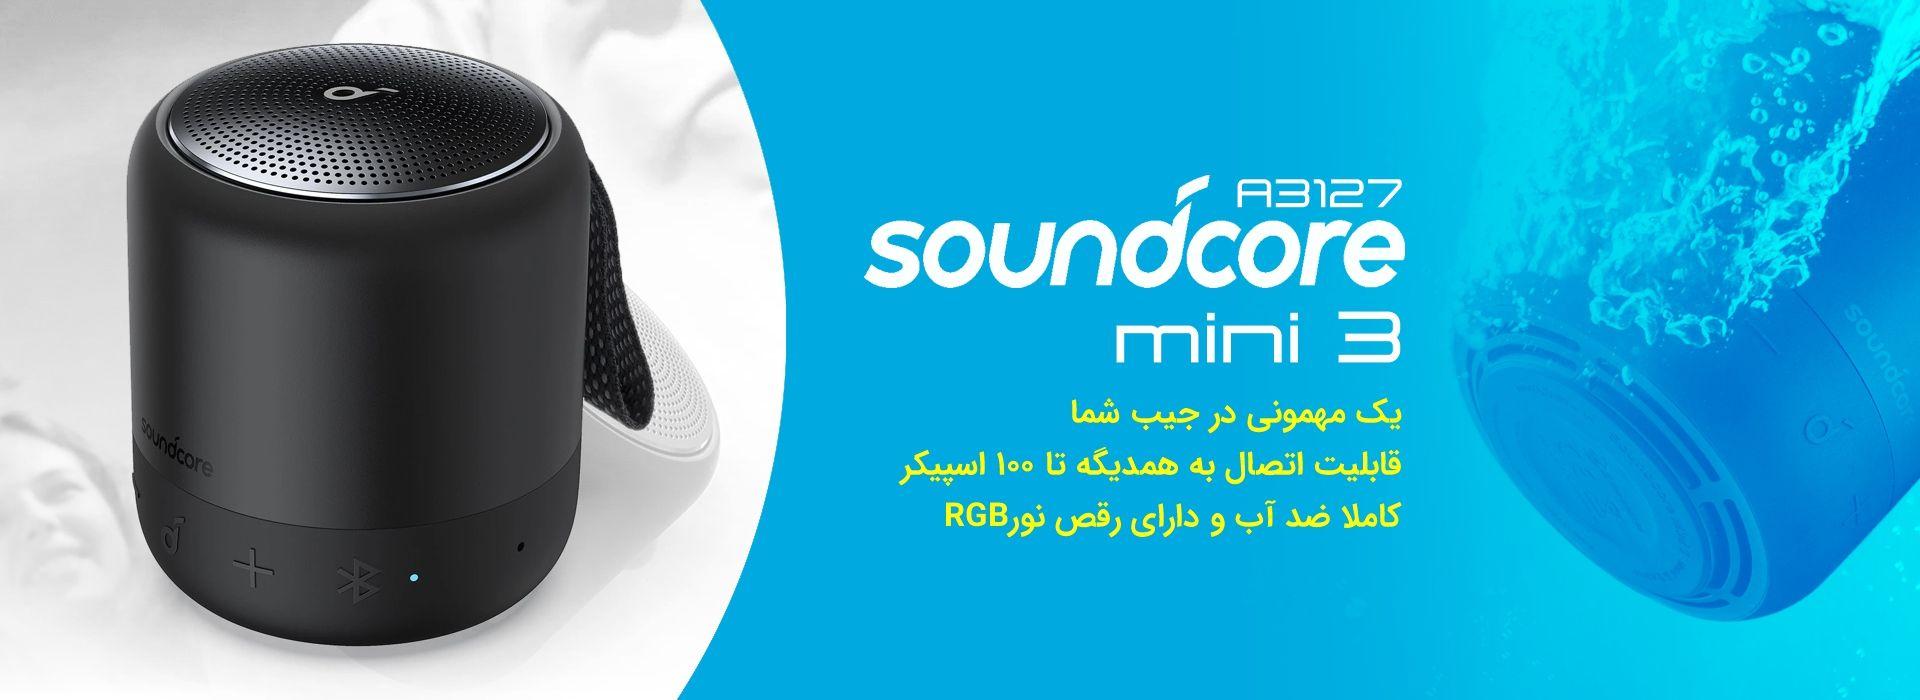 A3127 soundcore mini 3